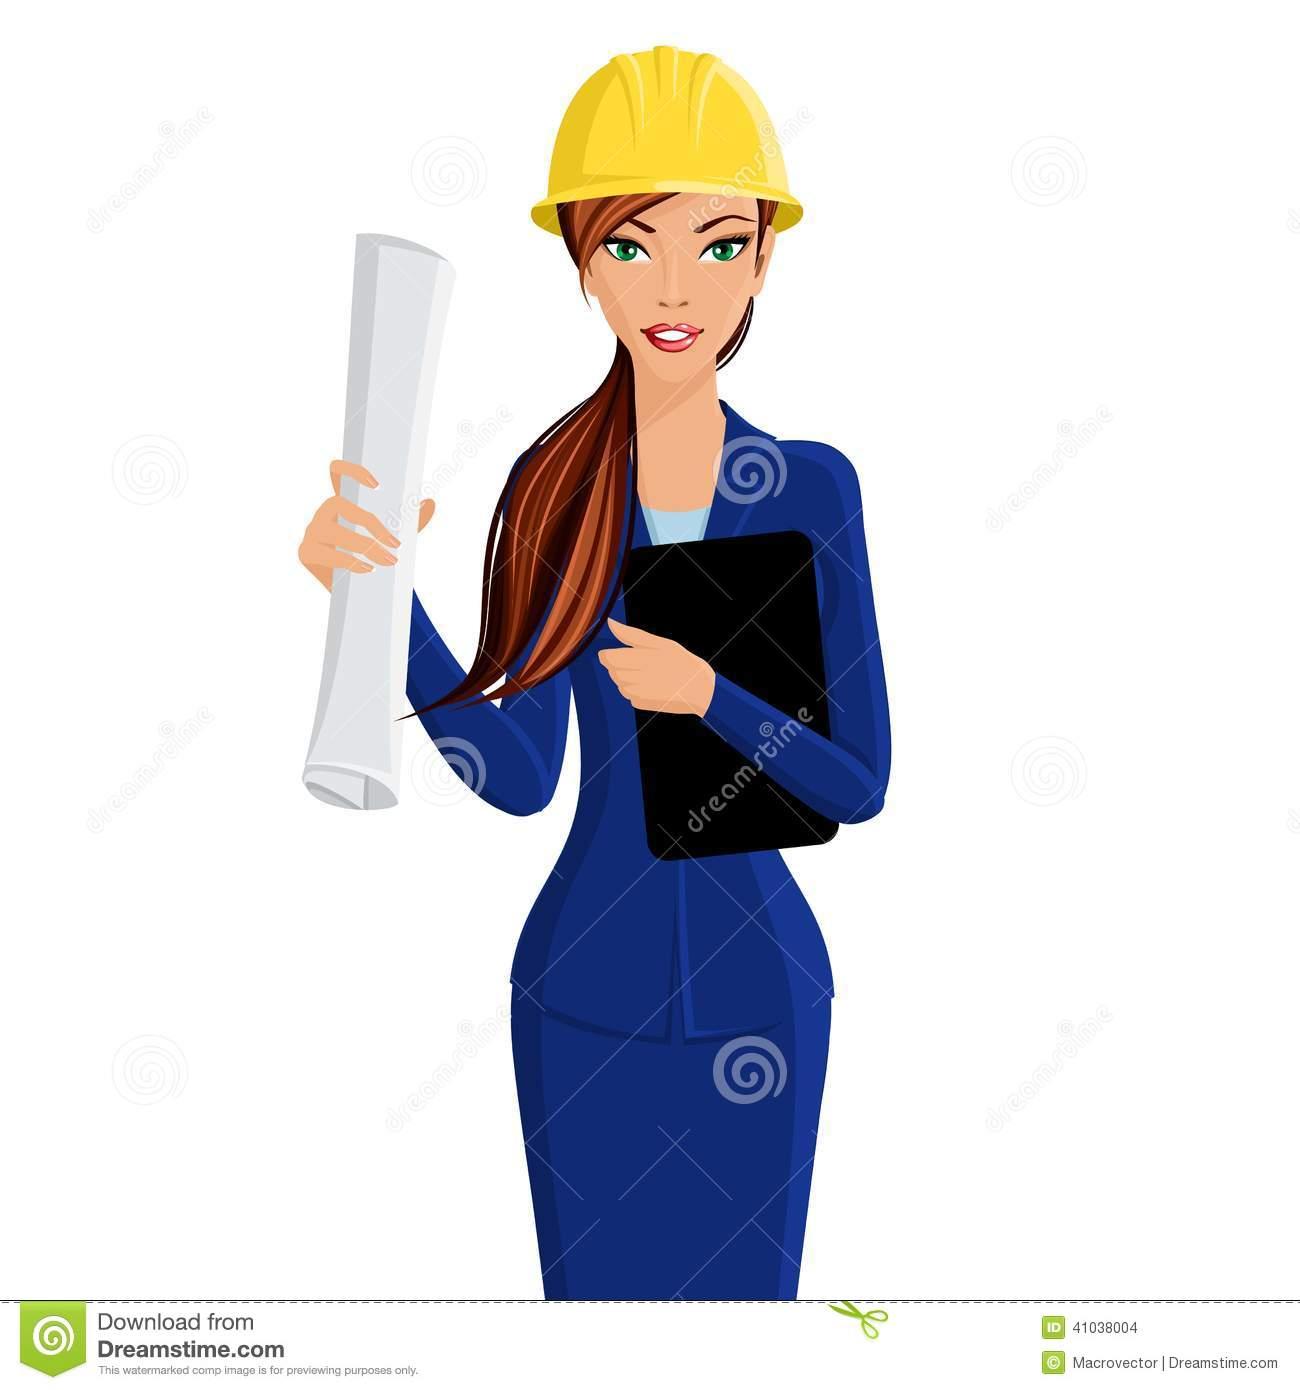 Free download best . Engineer clipart female engineer